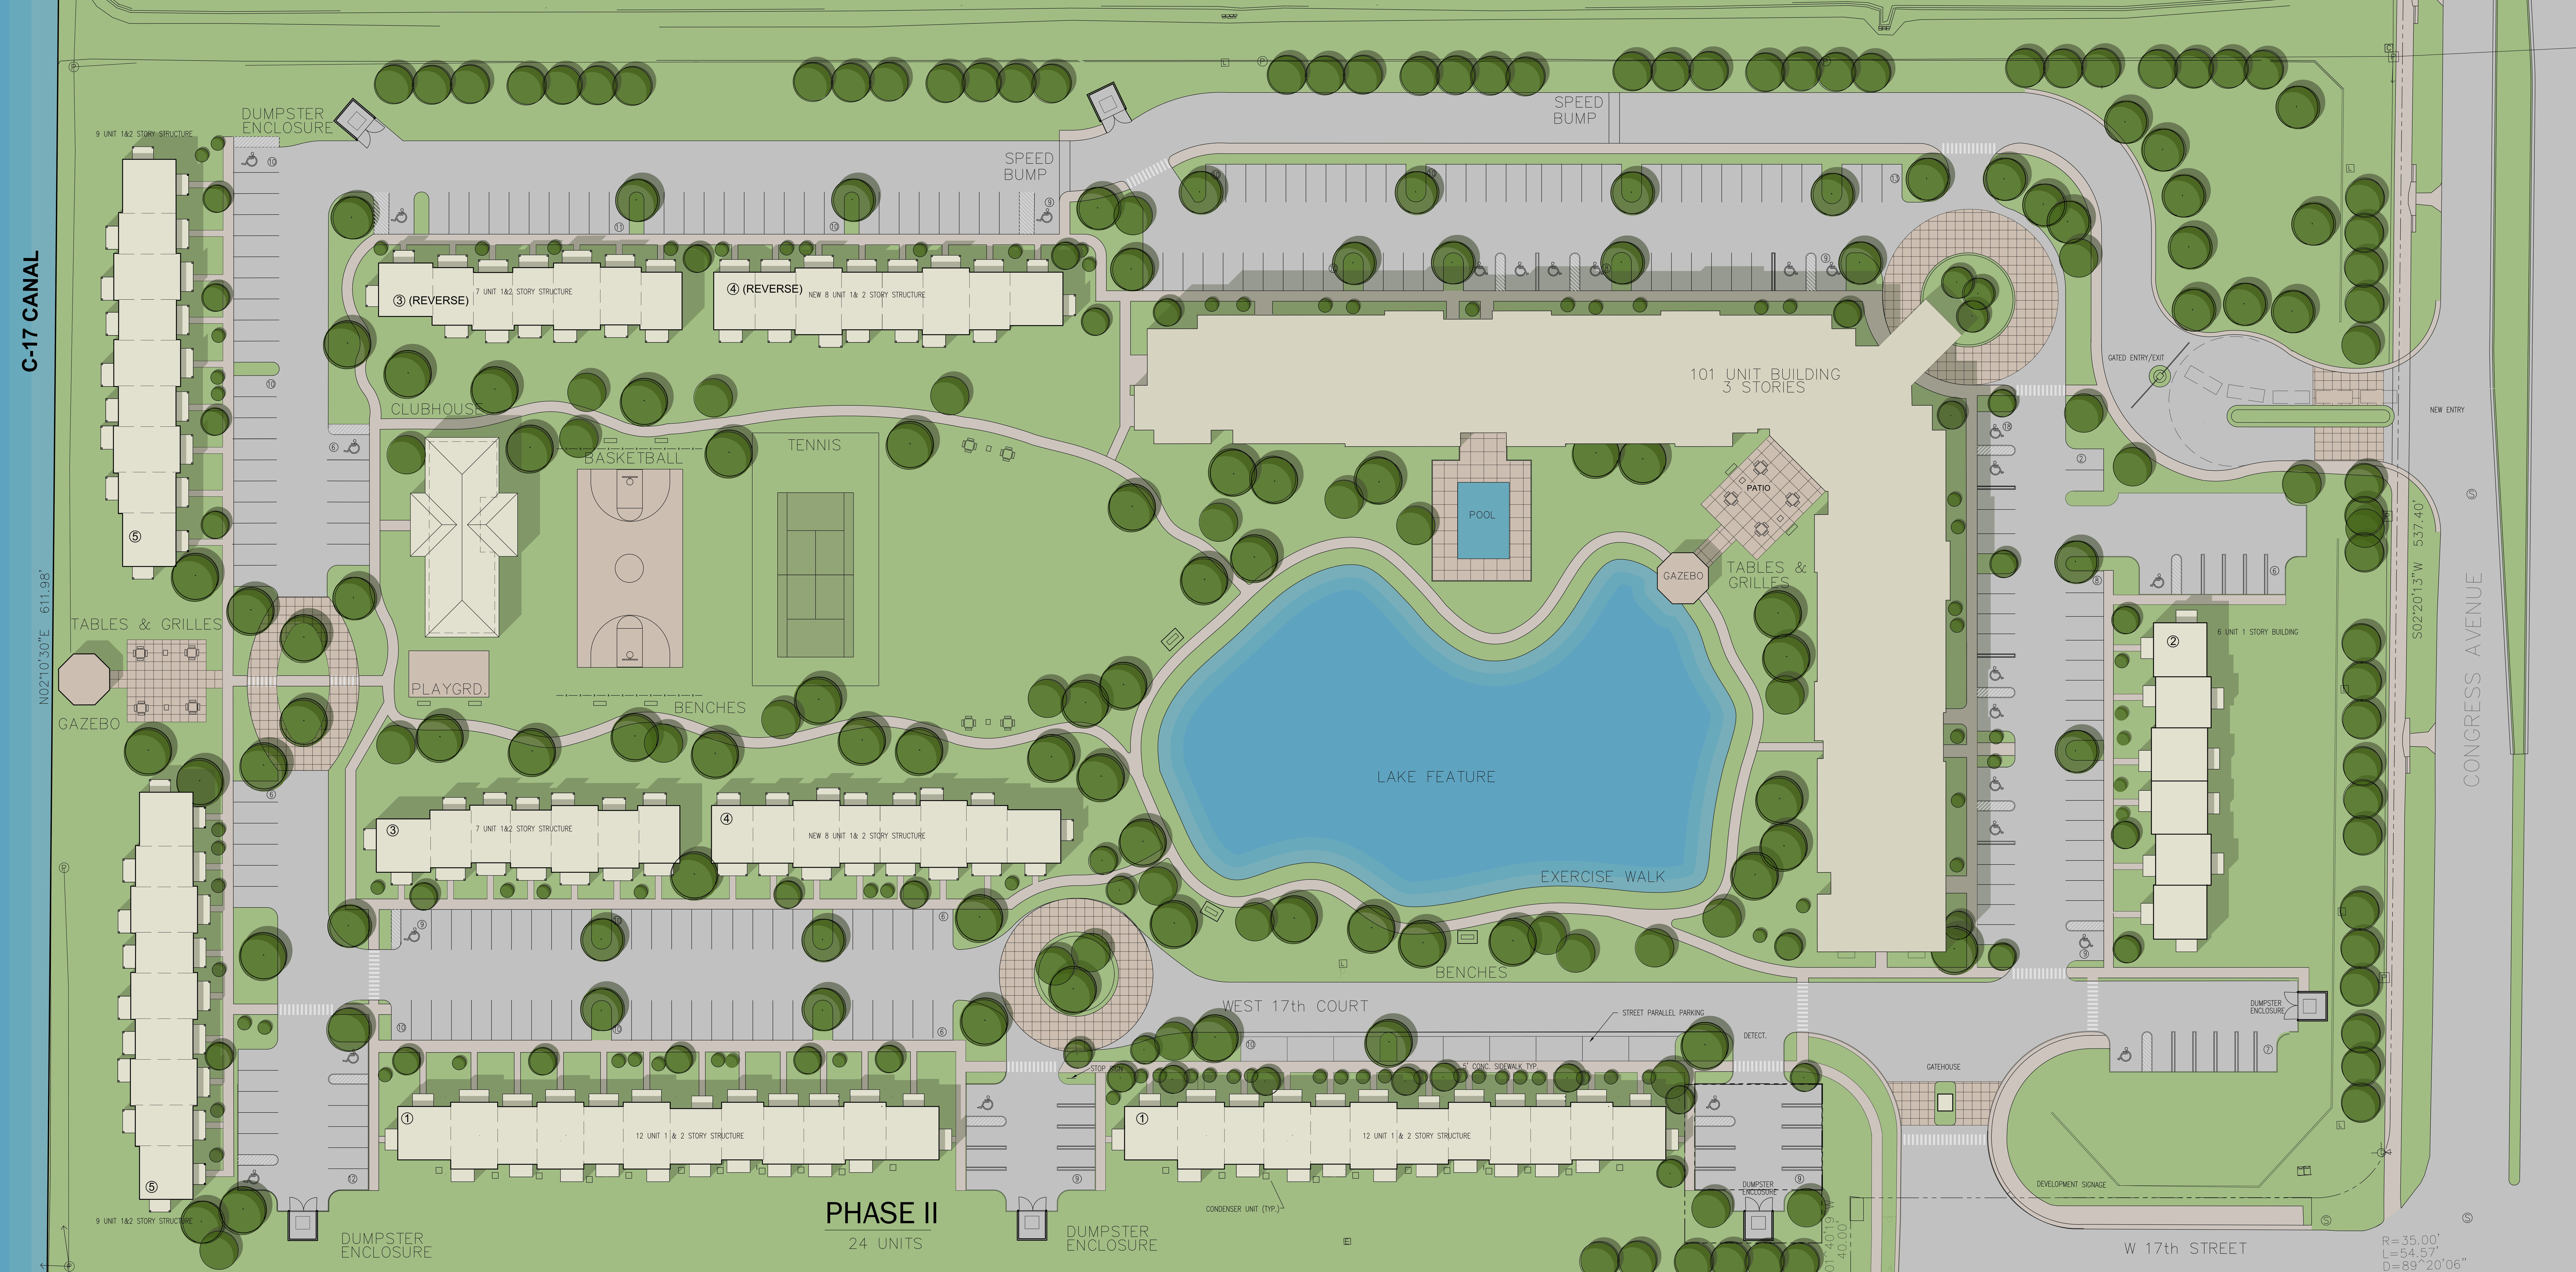 site plan 11-4-18.jpg